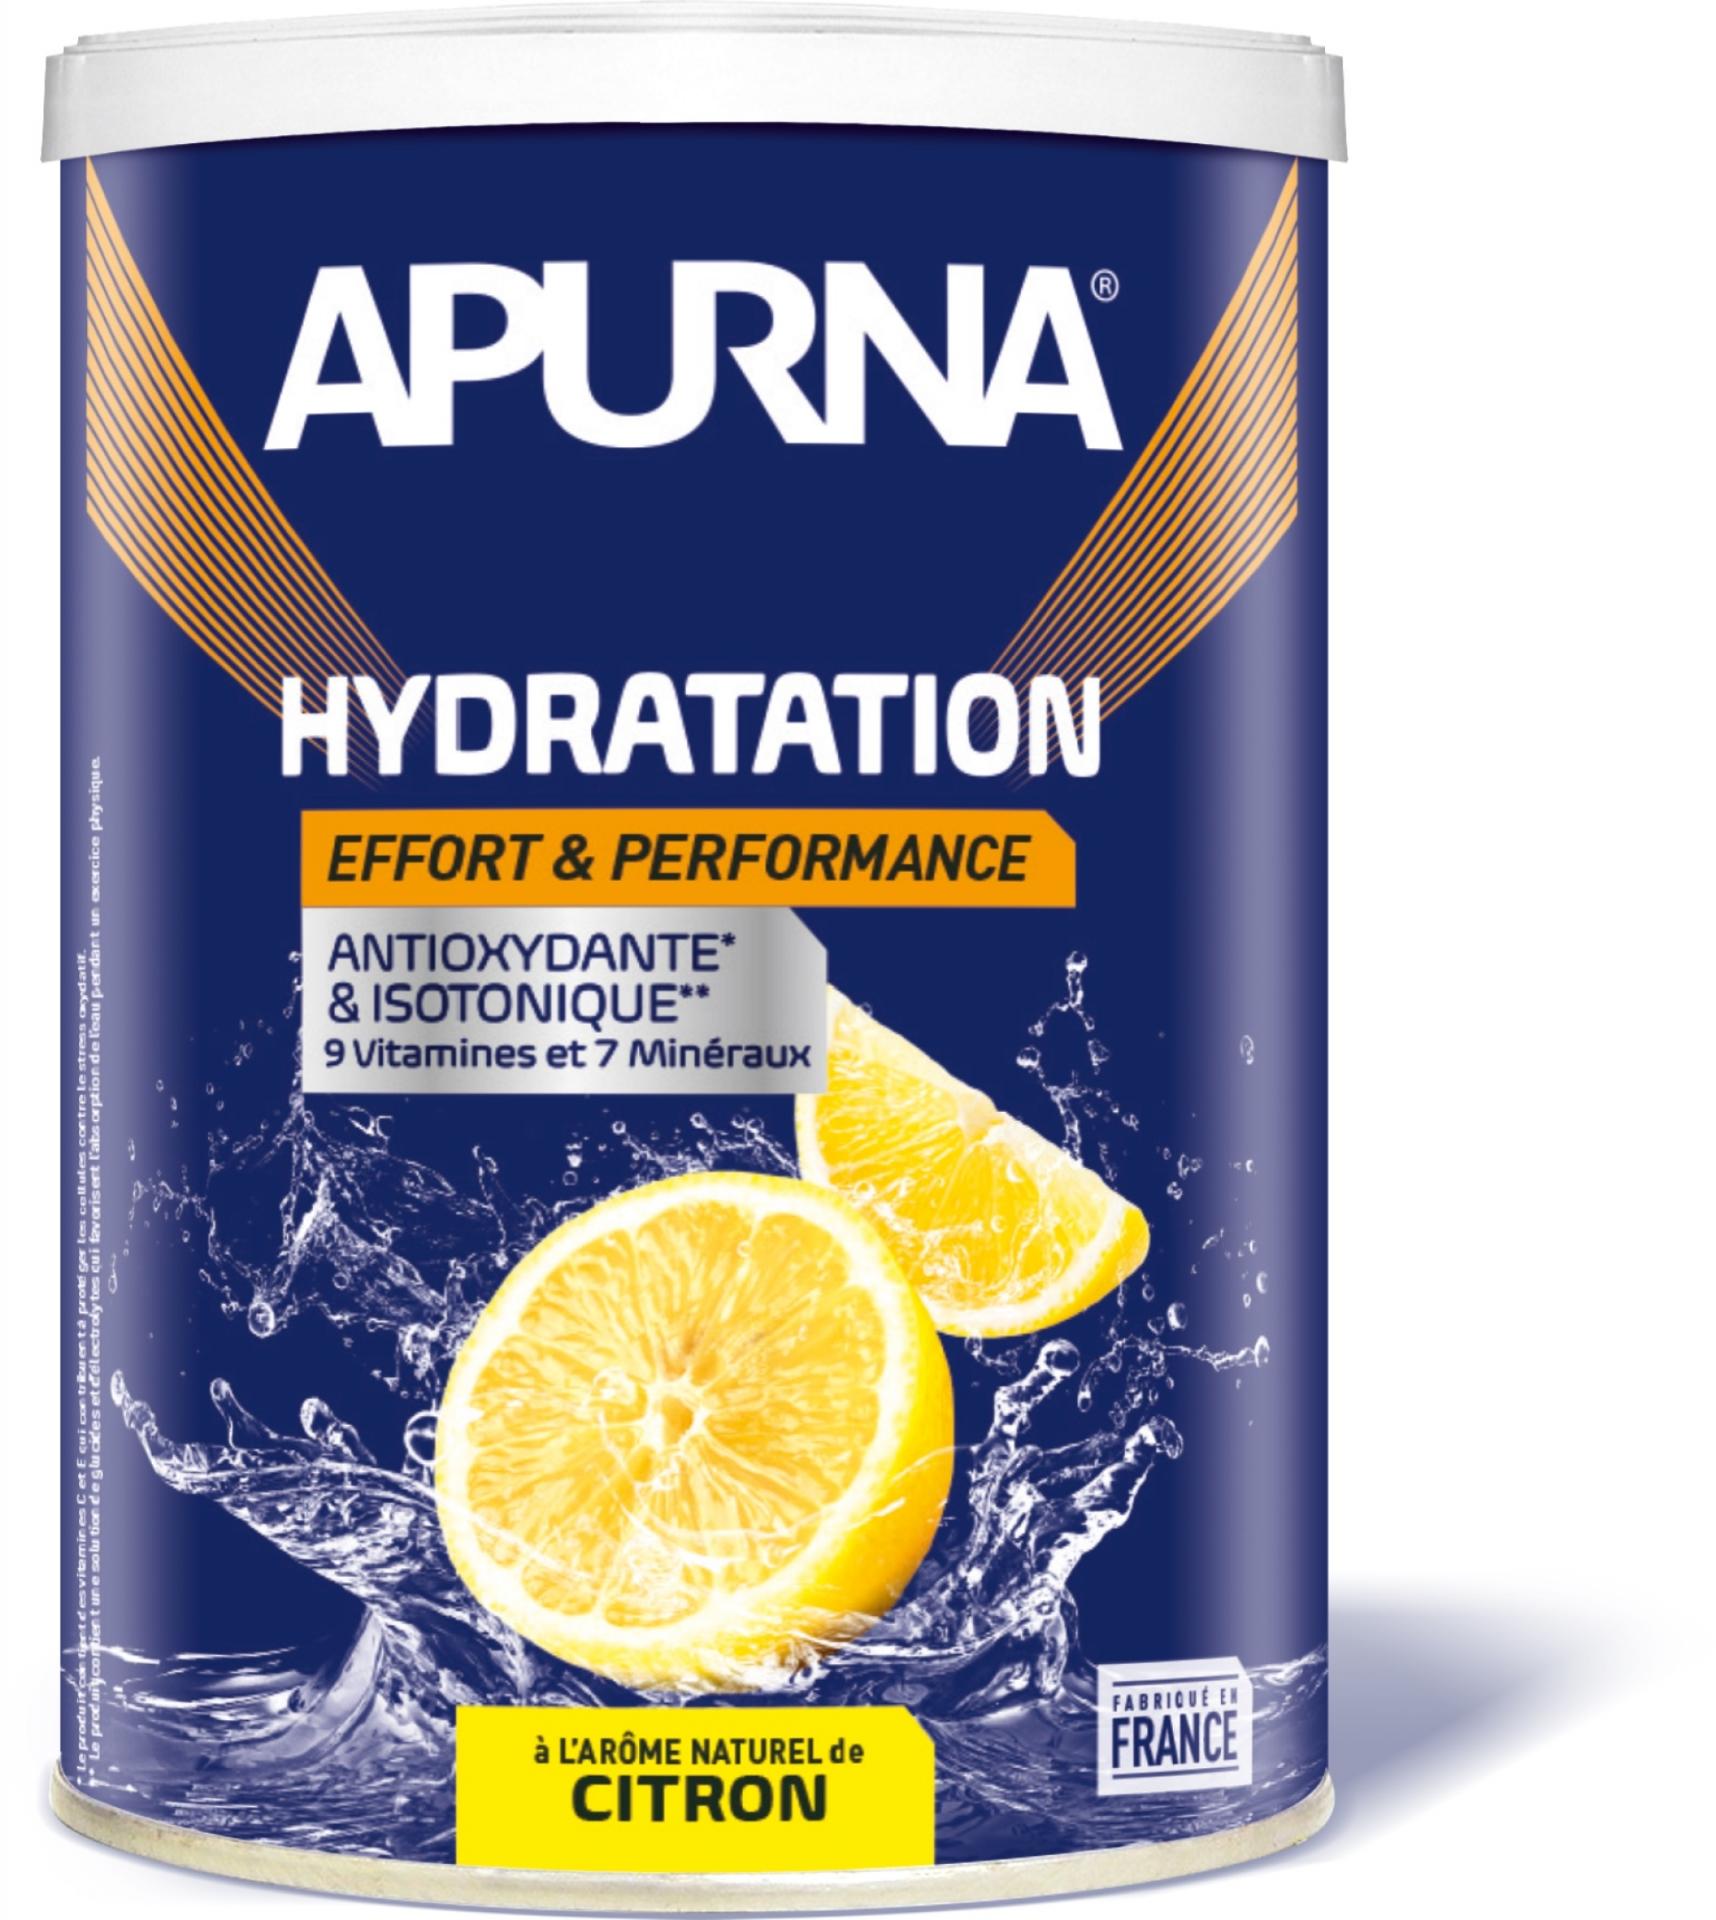 Boisson hydratation Apurna énergie Citron 500 g + 1 bidon